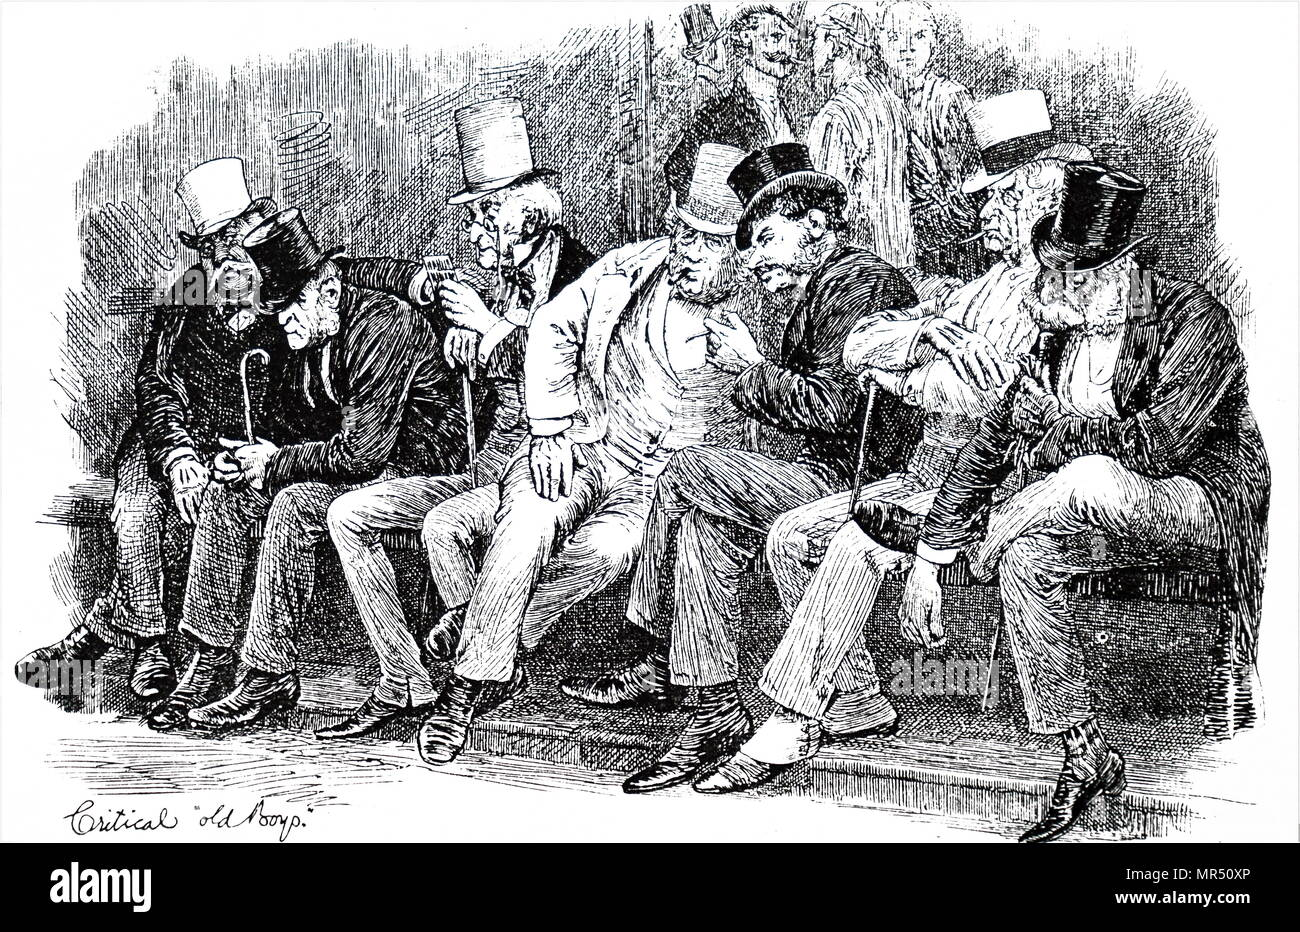 Illustration depicting spectators watching an Eton College and Harrow School cricket match. Illustrated by Hugh Thomson (1860-1920) an Irish illustrator. Dated 19th century - Stock Image